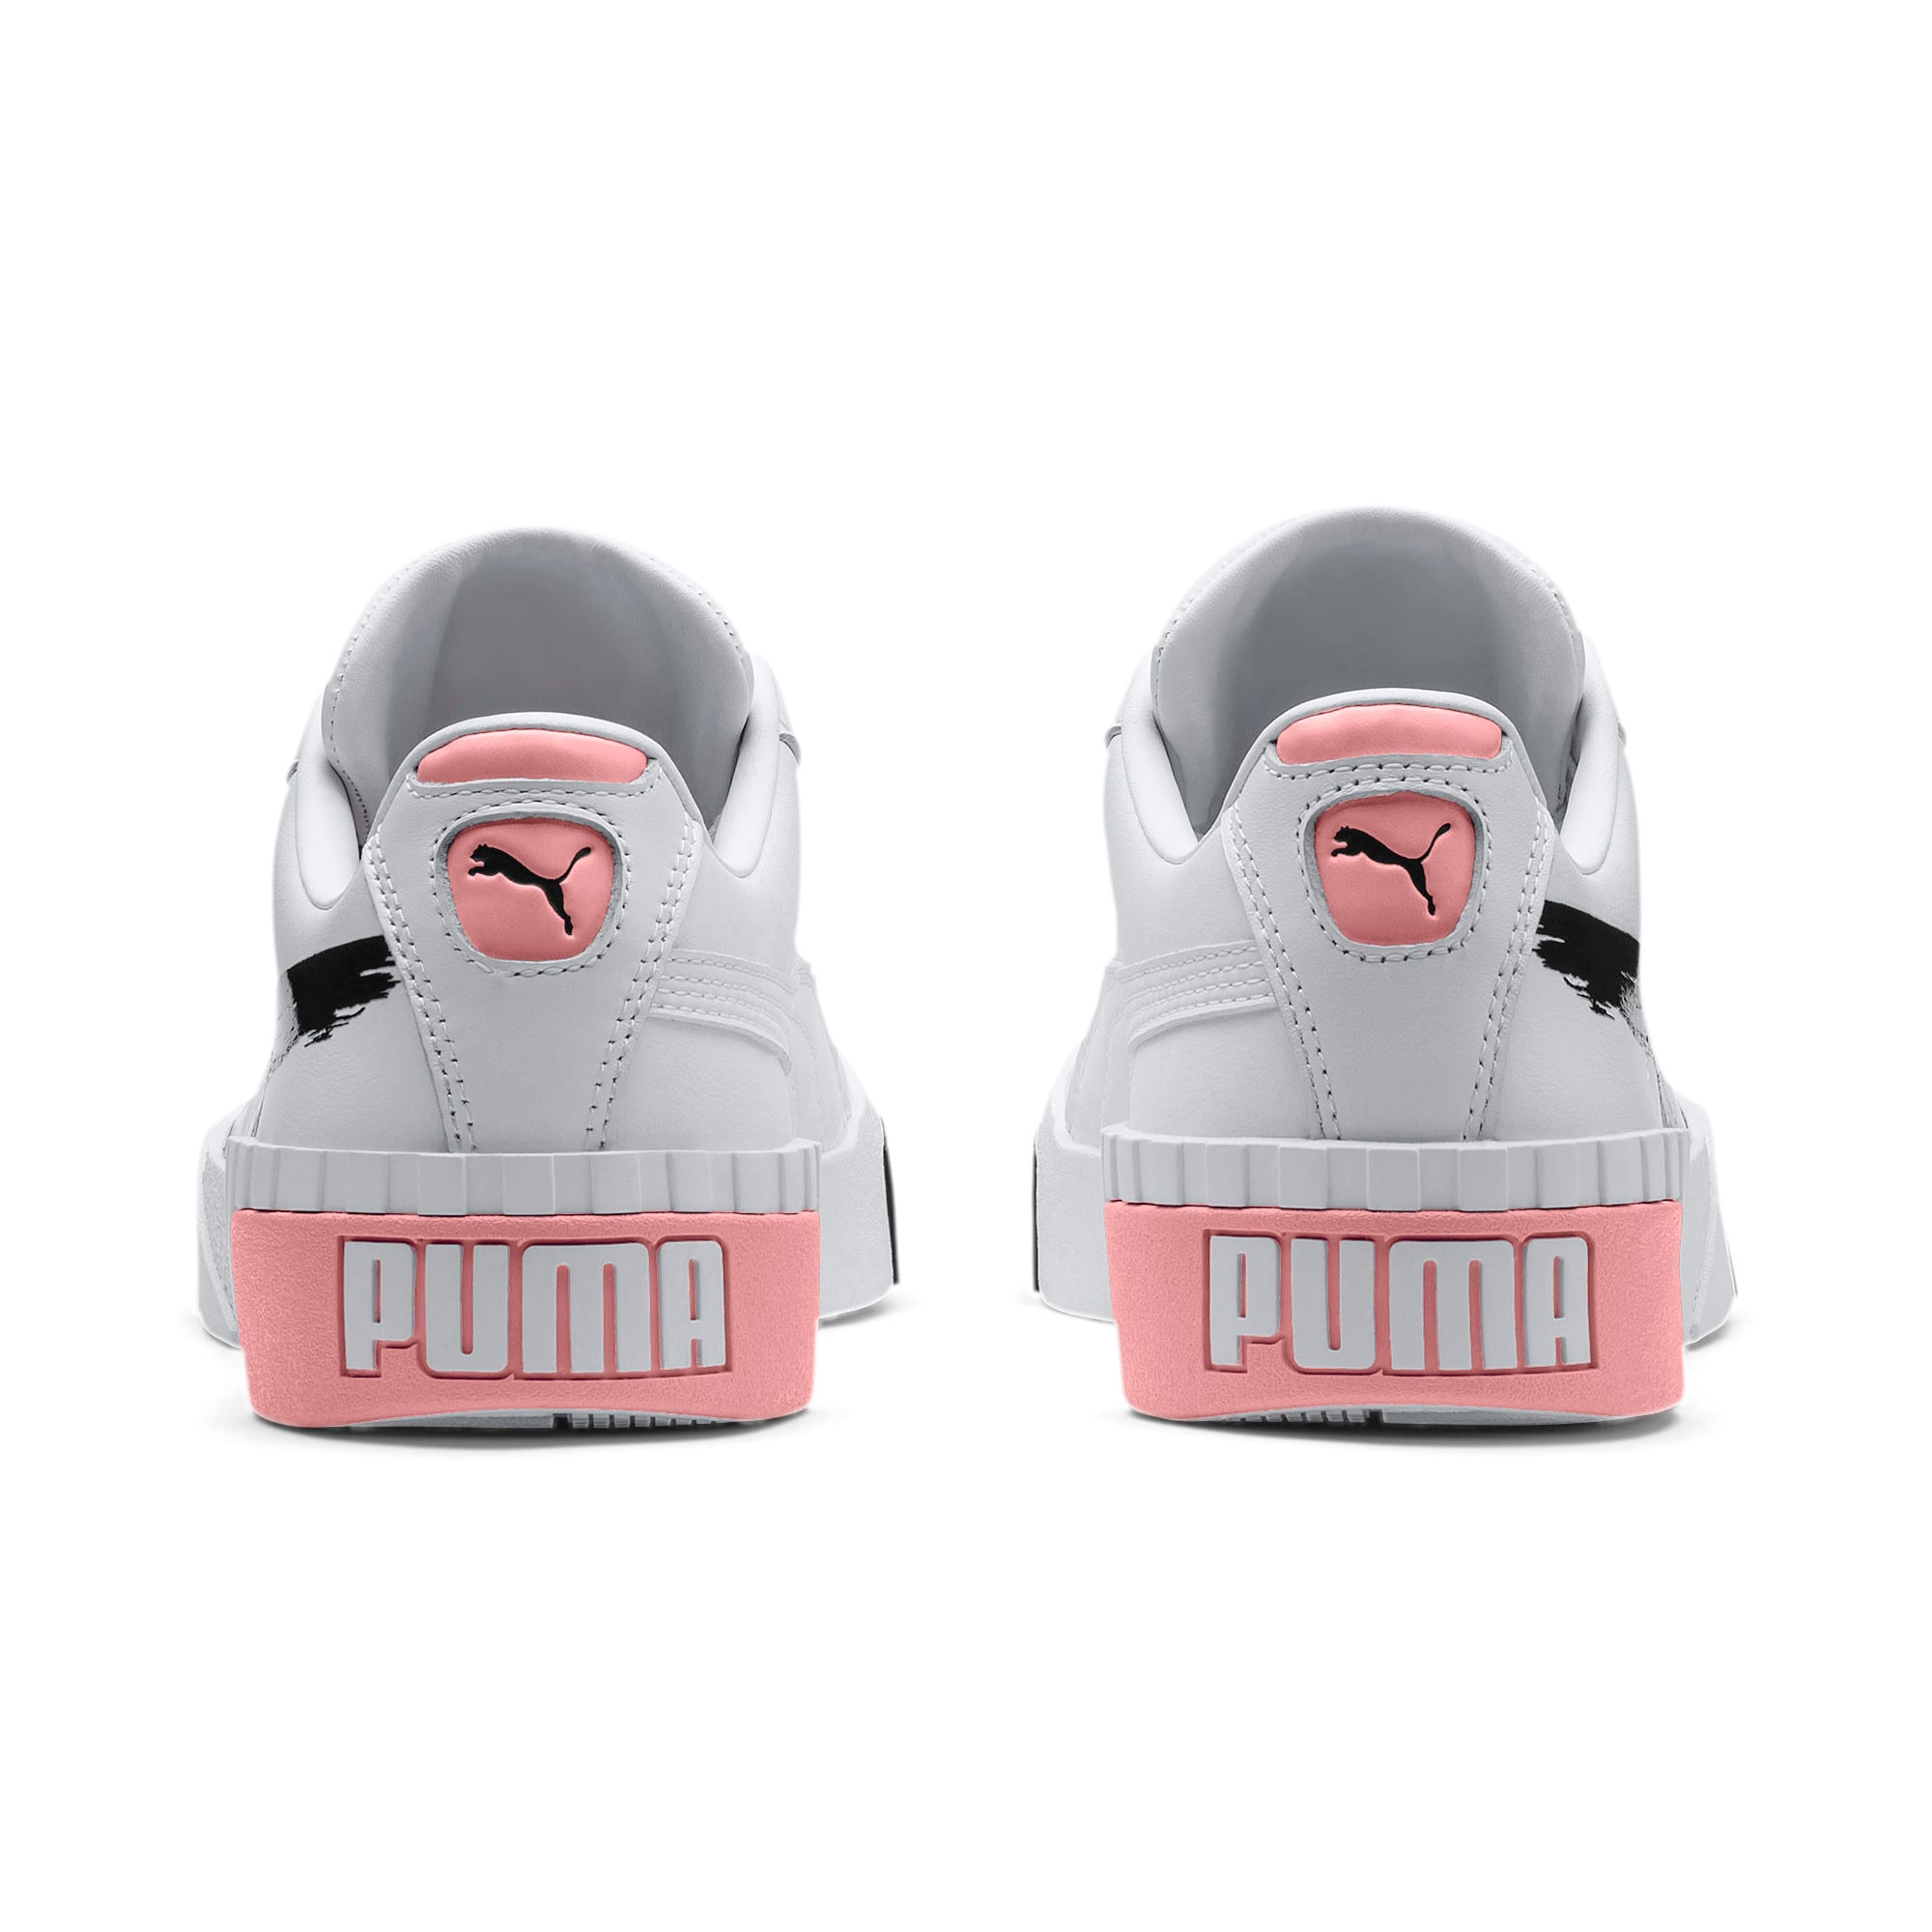 Thumbnail 3 of PUMA x MAYBELLINE Cali Women's Sneakers, Puma White-Puma Black, medium